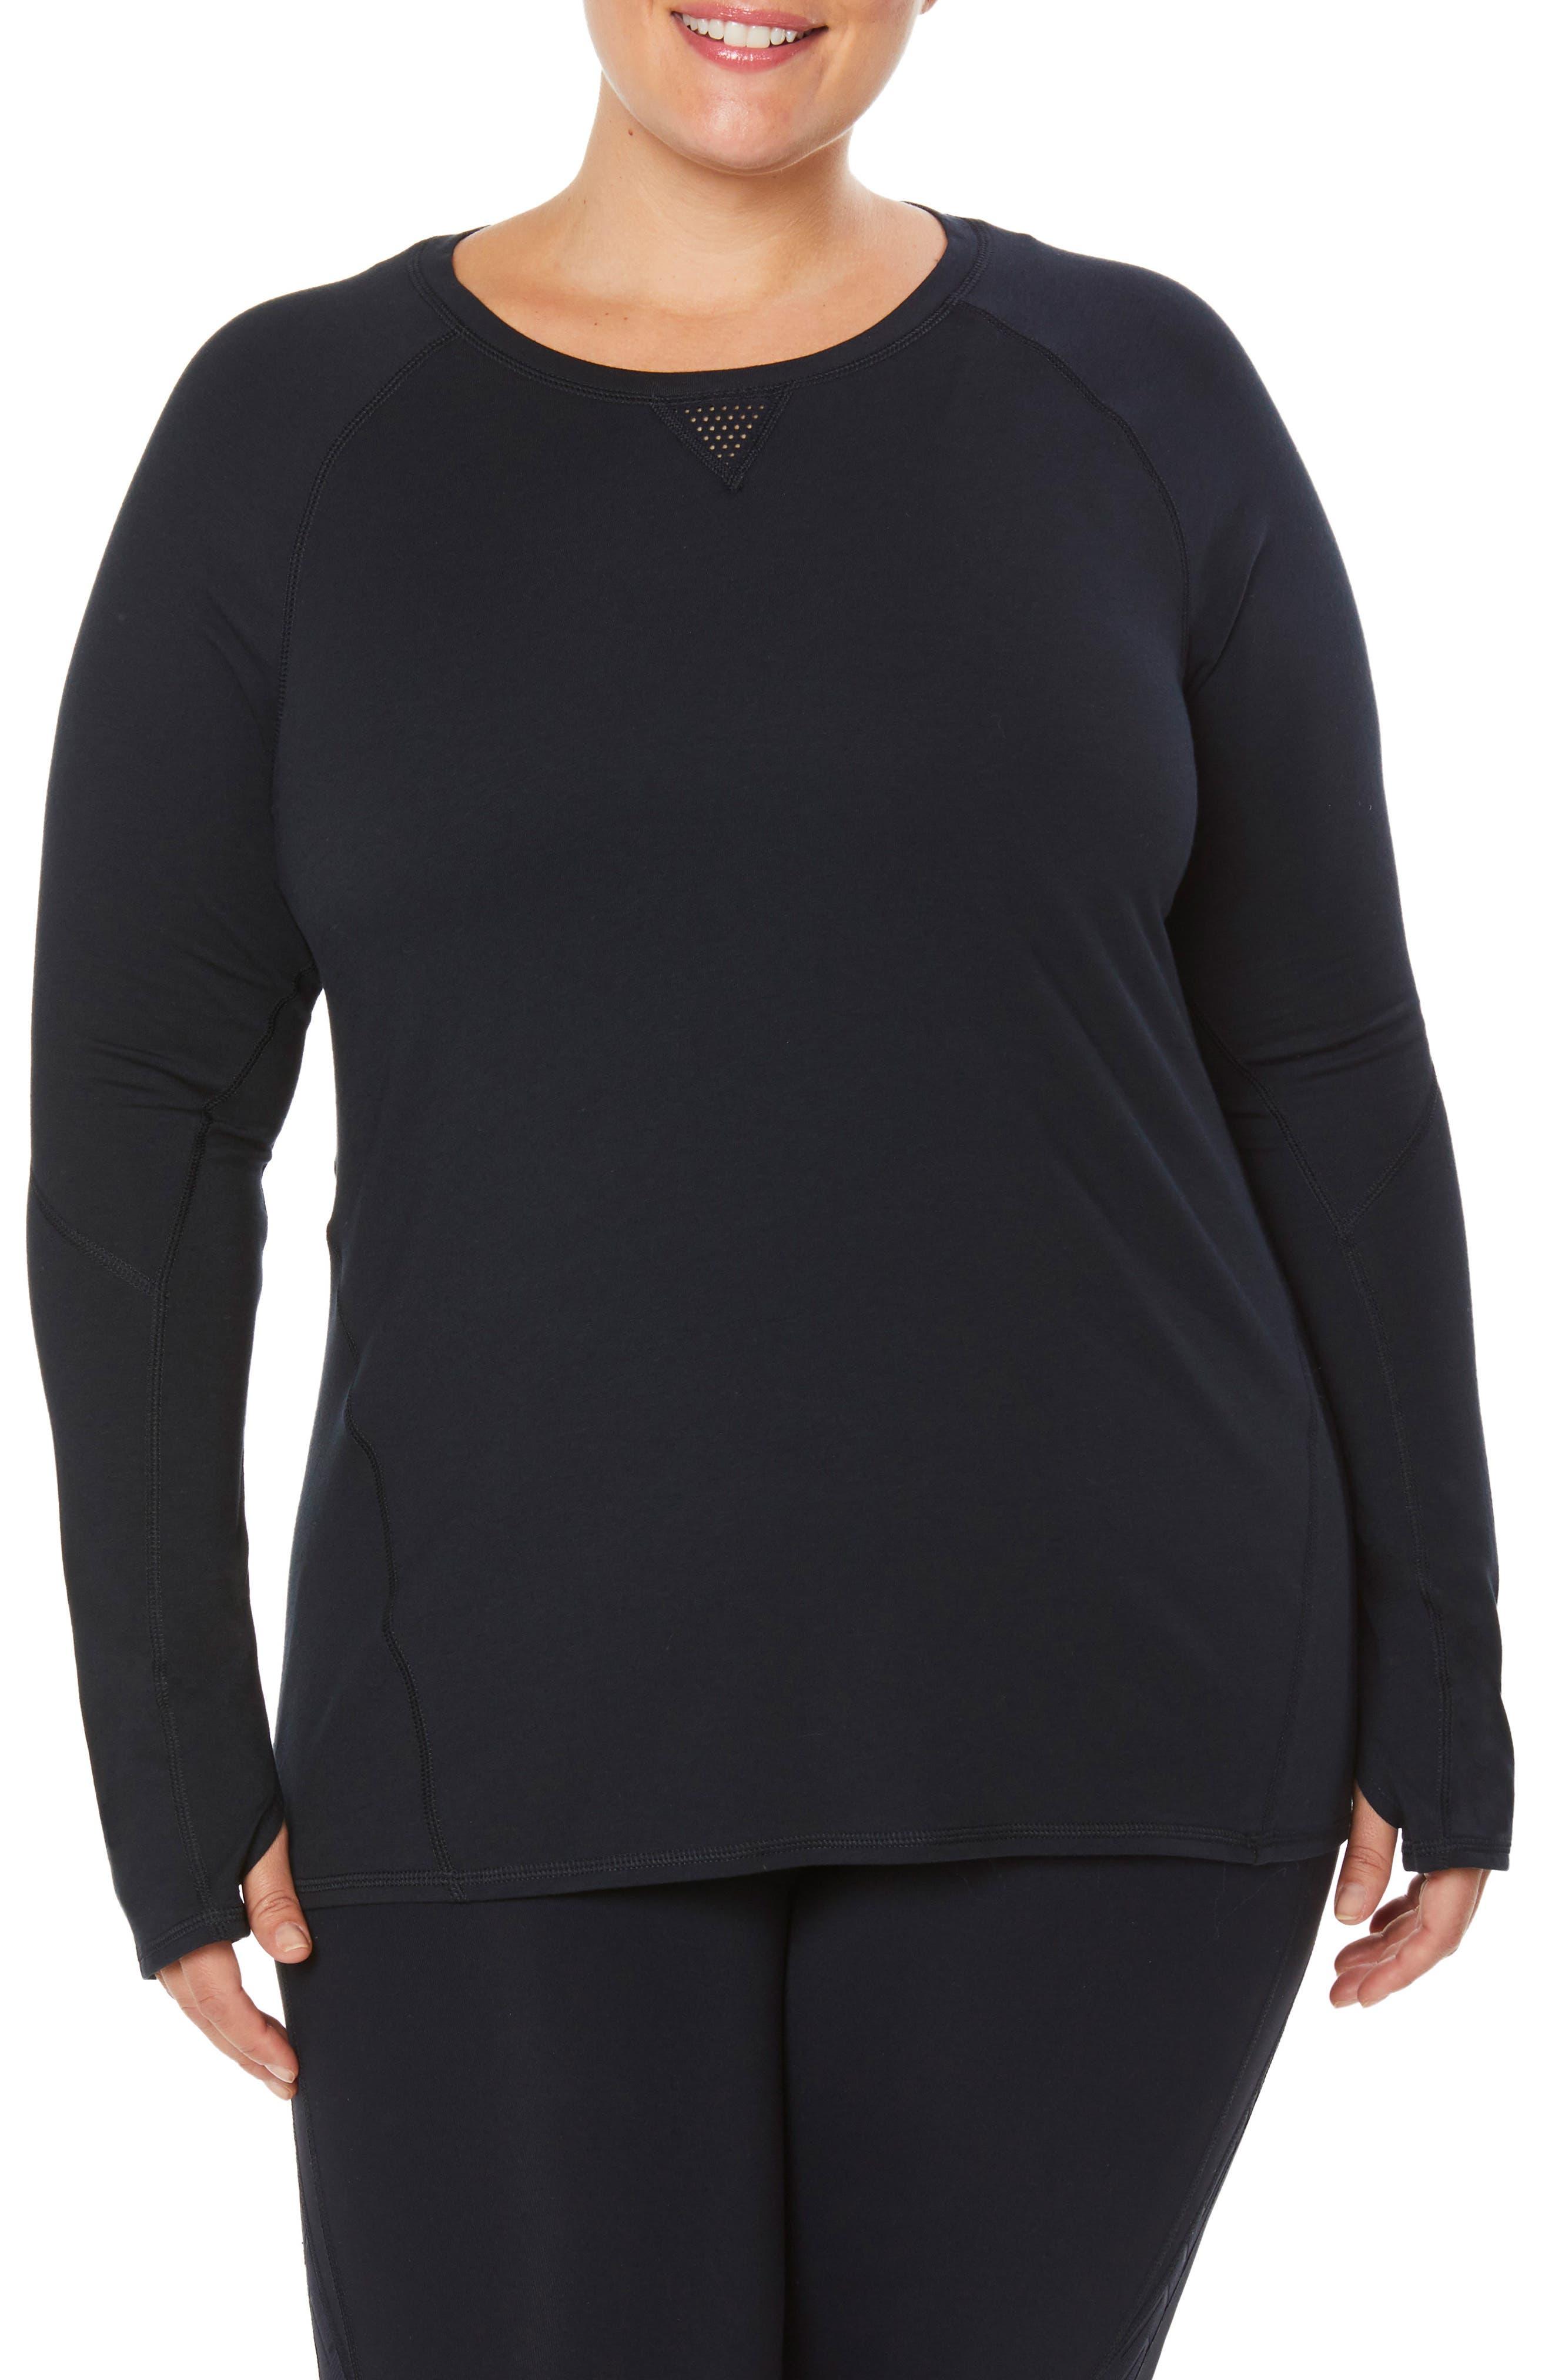 Plus Size Shape Activewear Movement Tee, Black